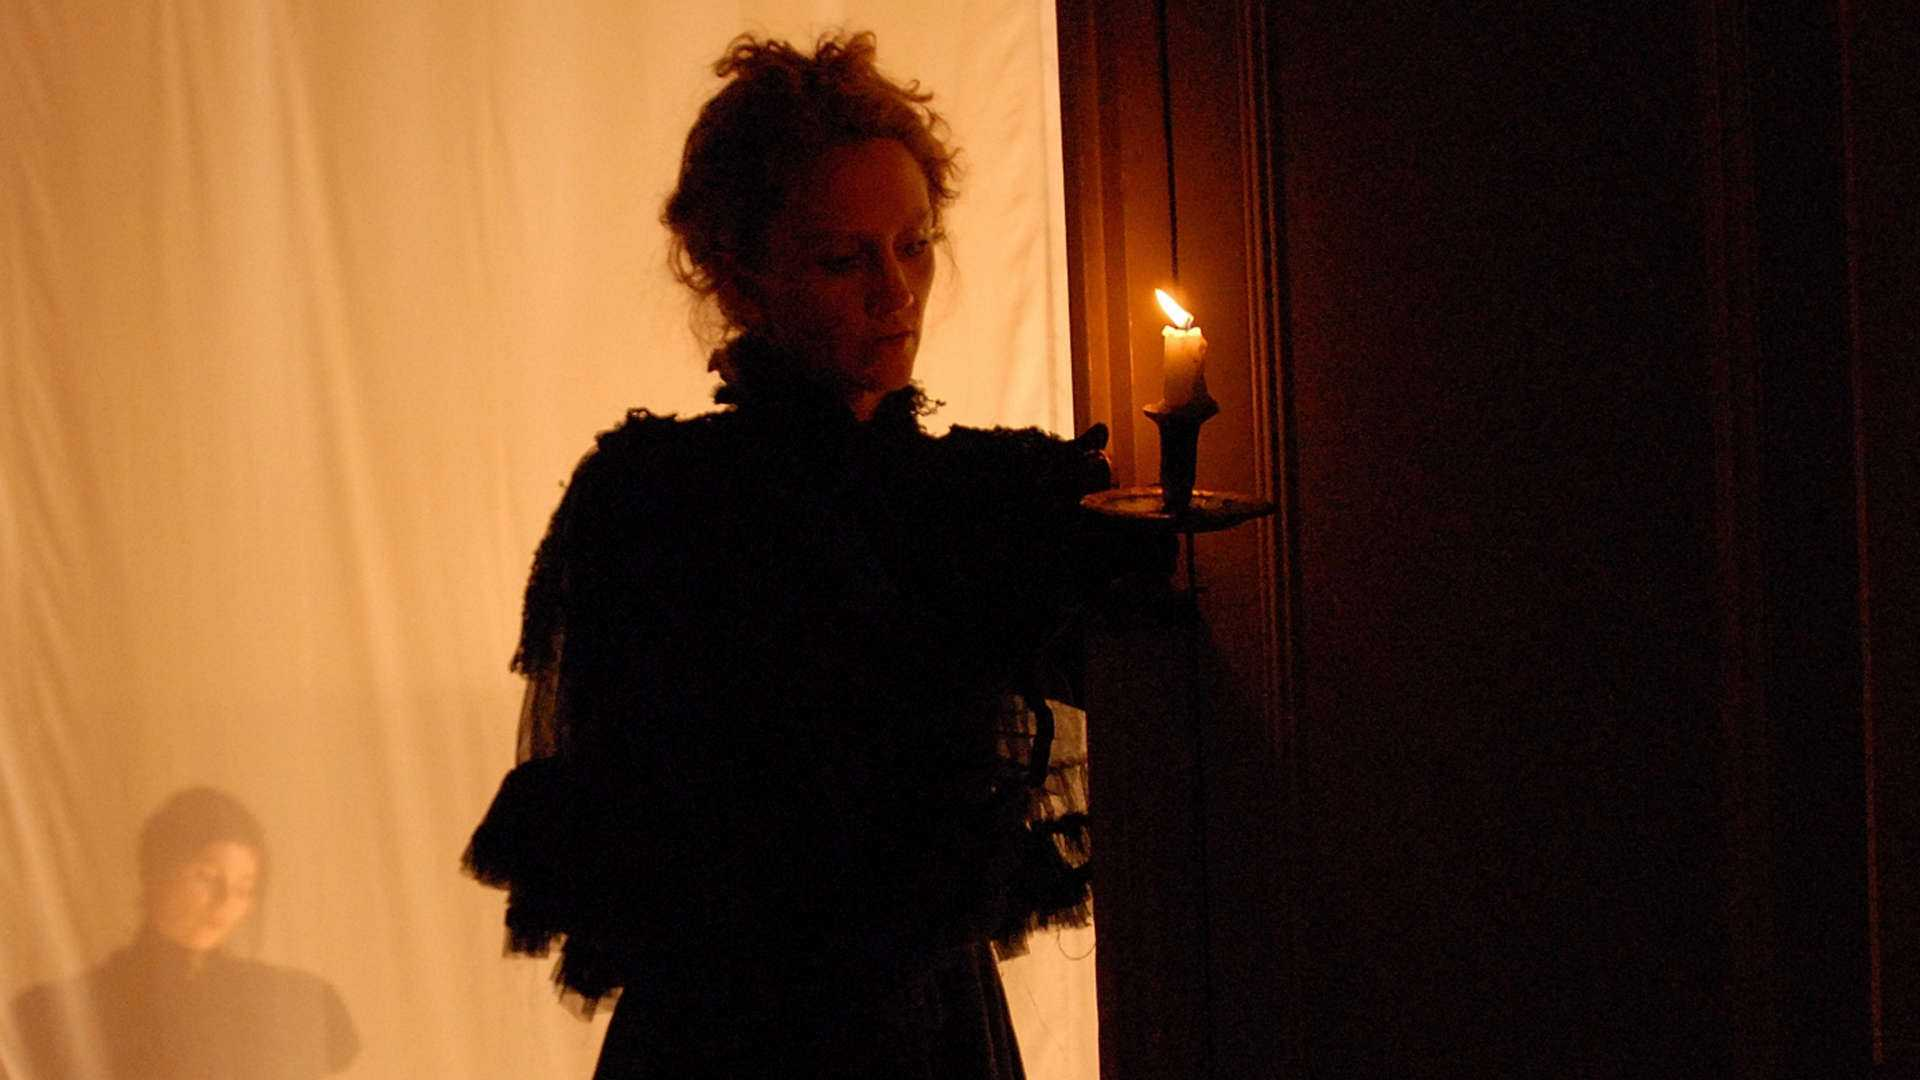 lament: candles & compost (2006)